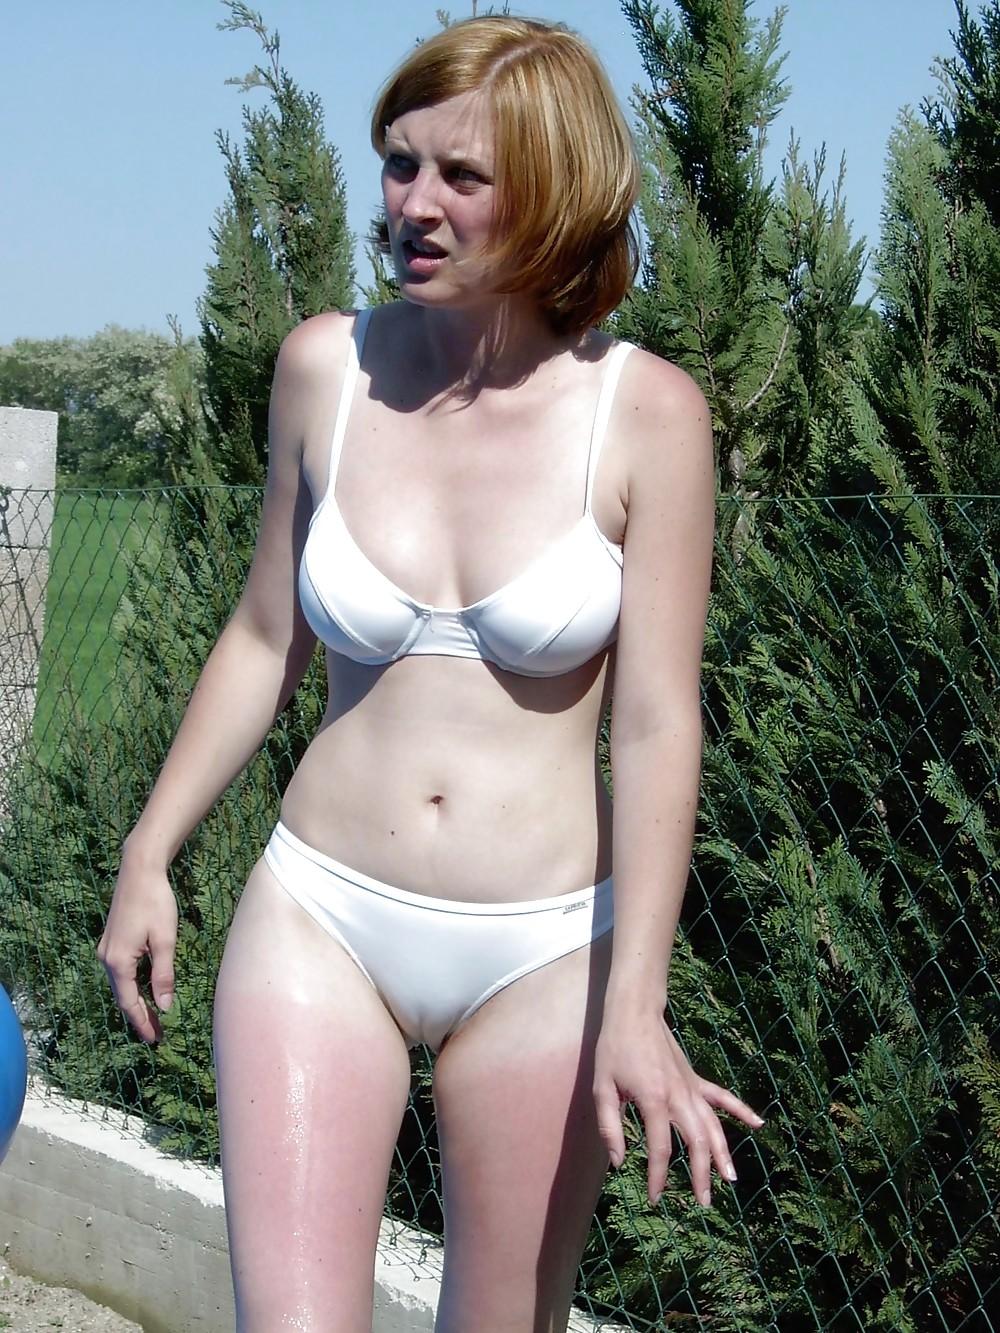 Porn Cameltoe Teens Bikini 61